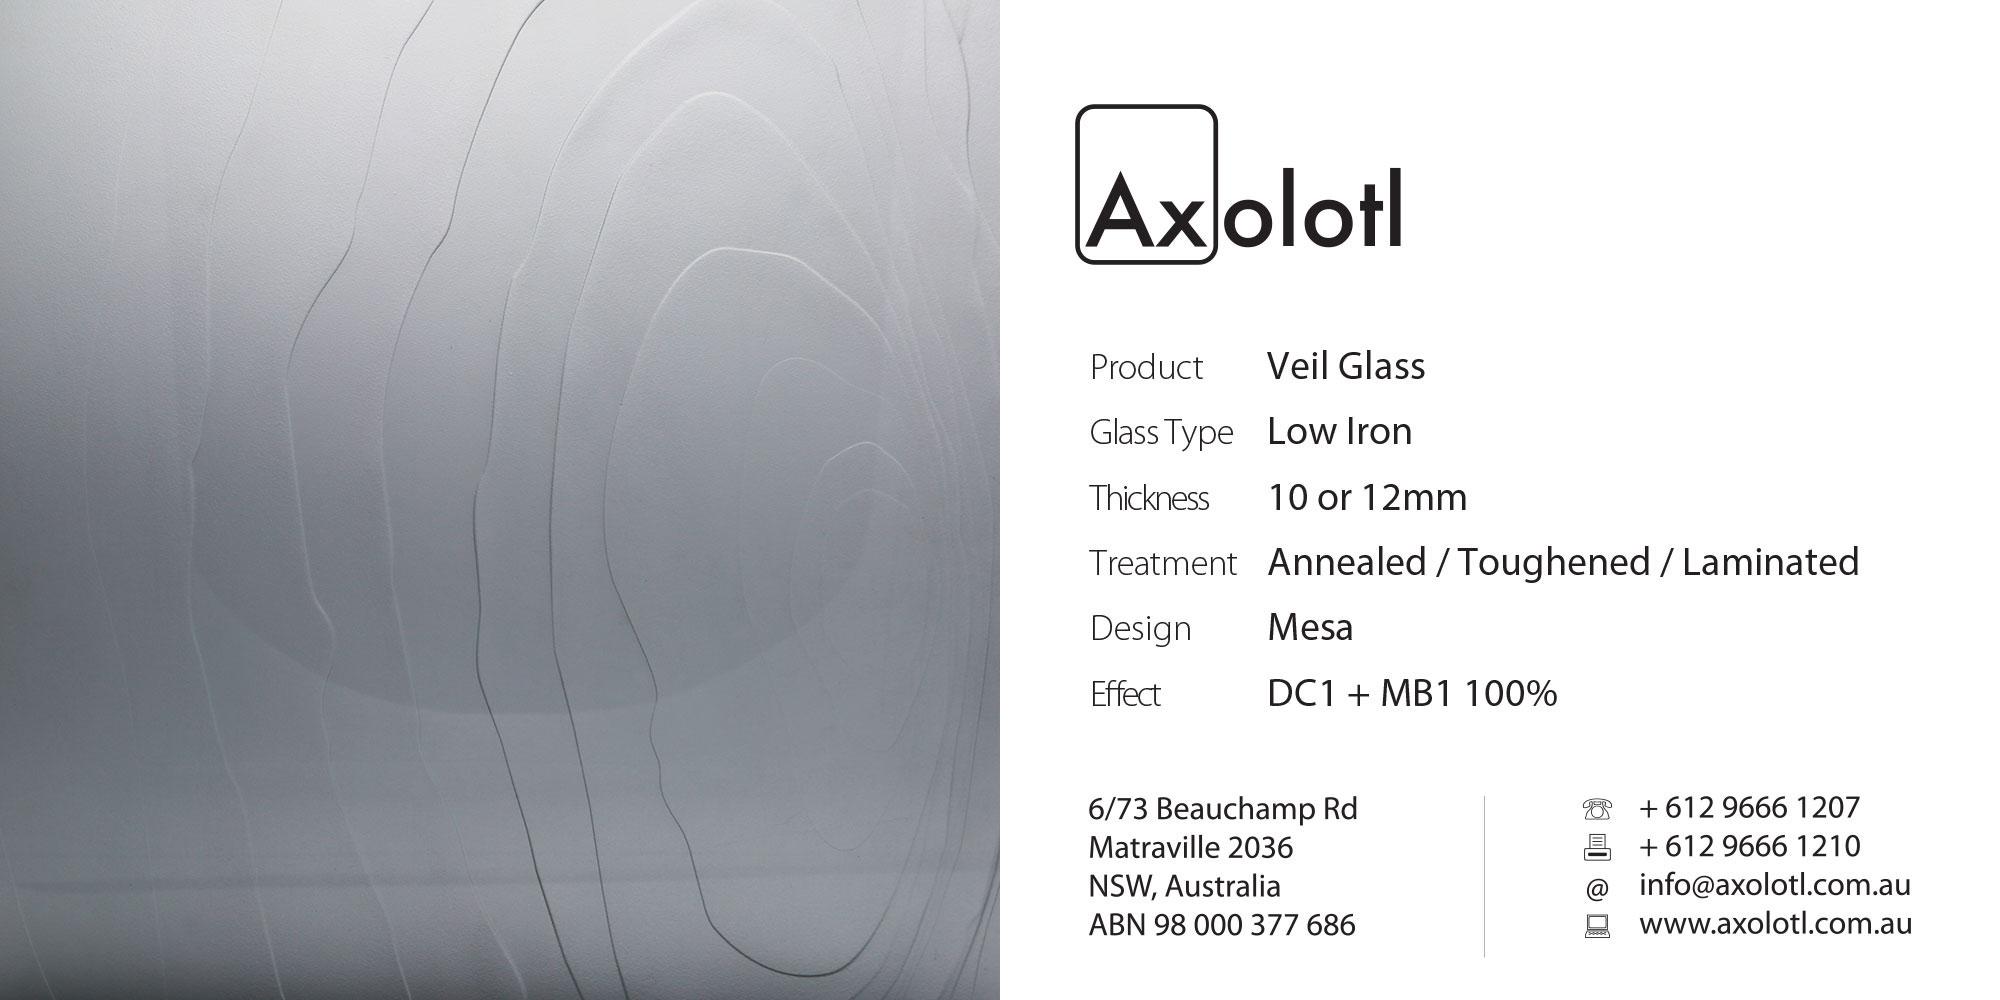 Axolotl_Veil_Glass_Mesa.jpg